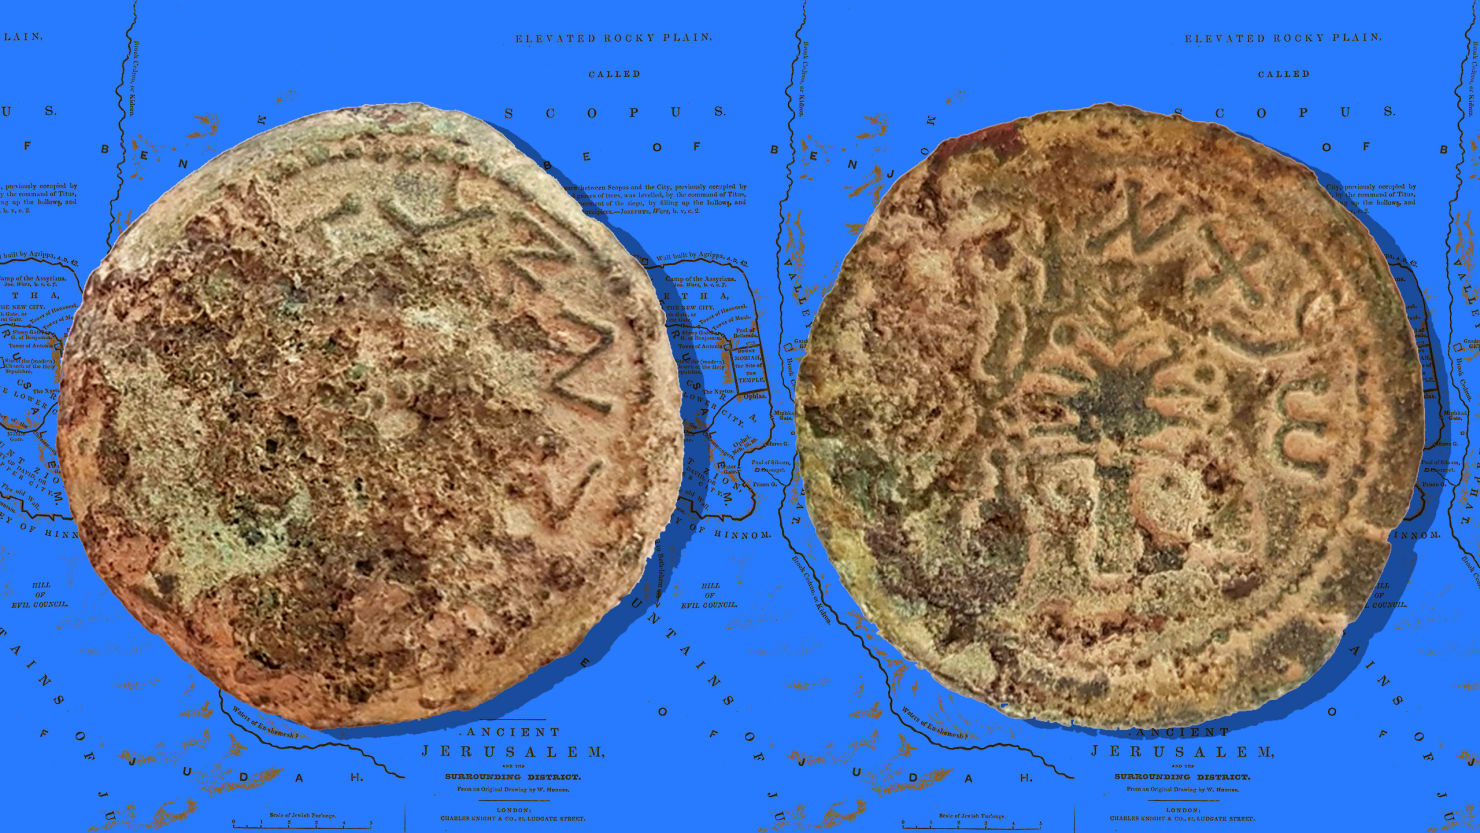 Rare Coin Sheds Light on Doomed Jewish Rebels